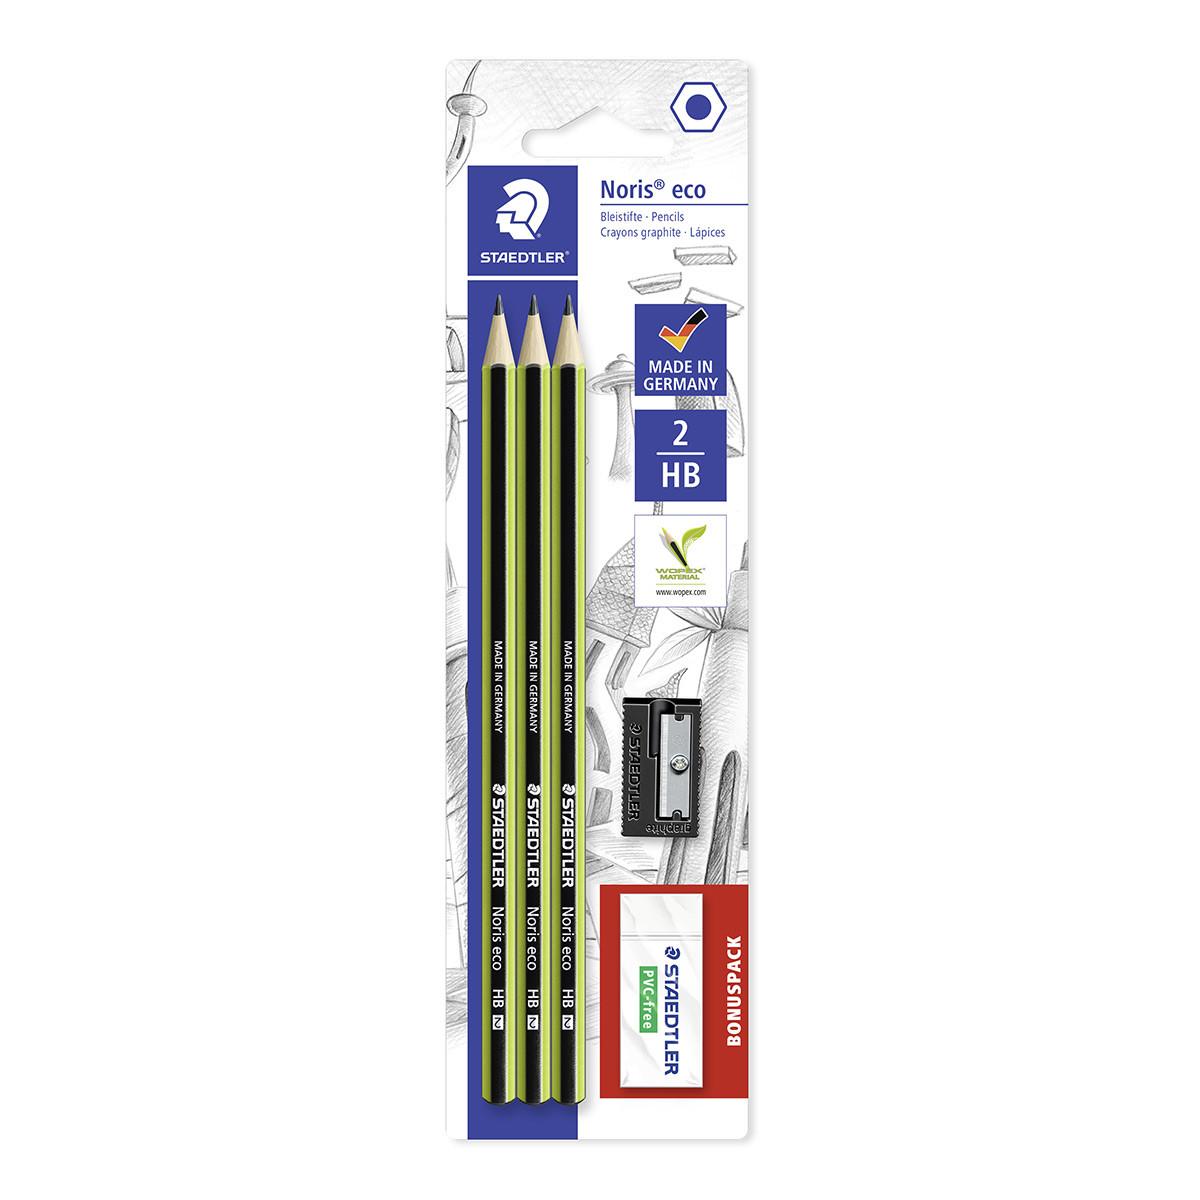 Staedtler Noris Eco Pencil Set with Eraser & Sharpener